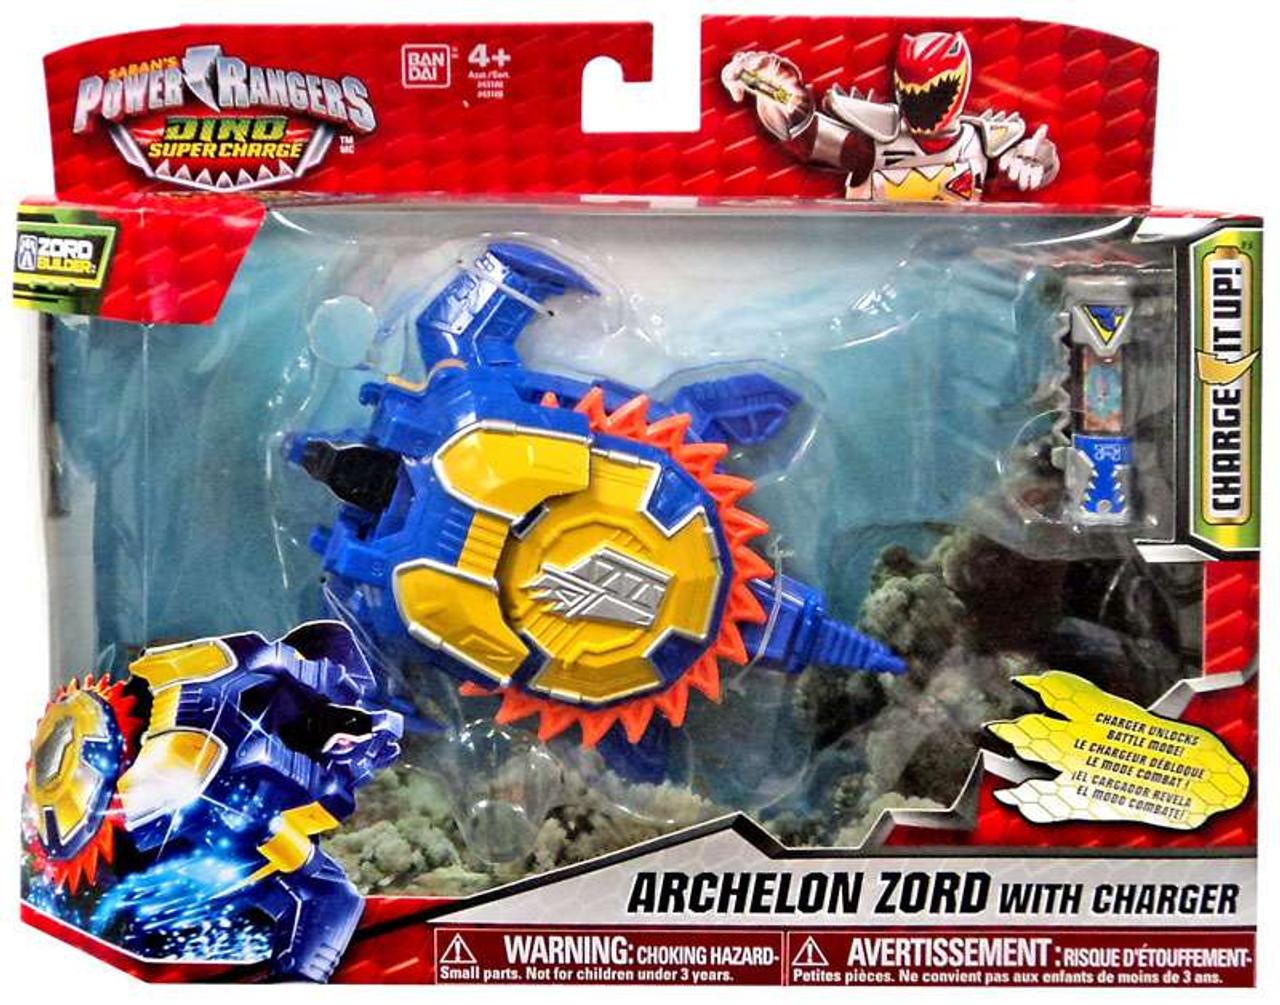 Power Rangers Dino Super Charge Archelon Zord 6 Action Figure Bandai America Toywiz